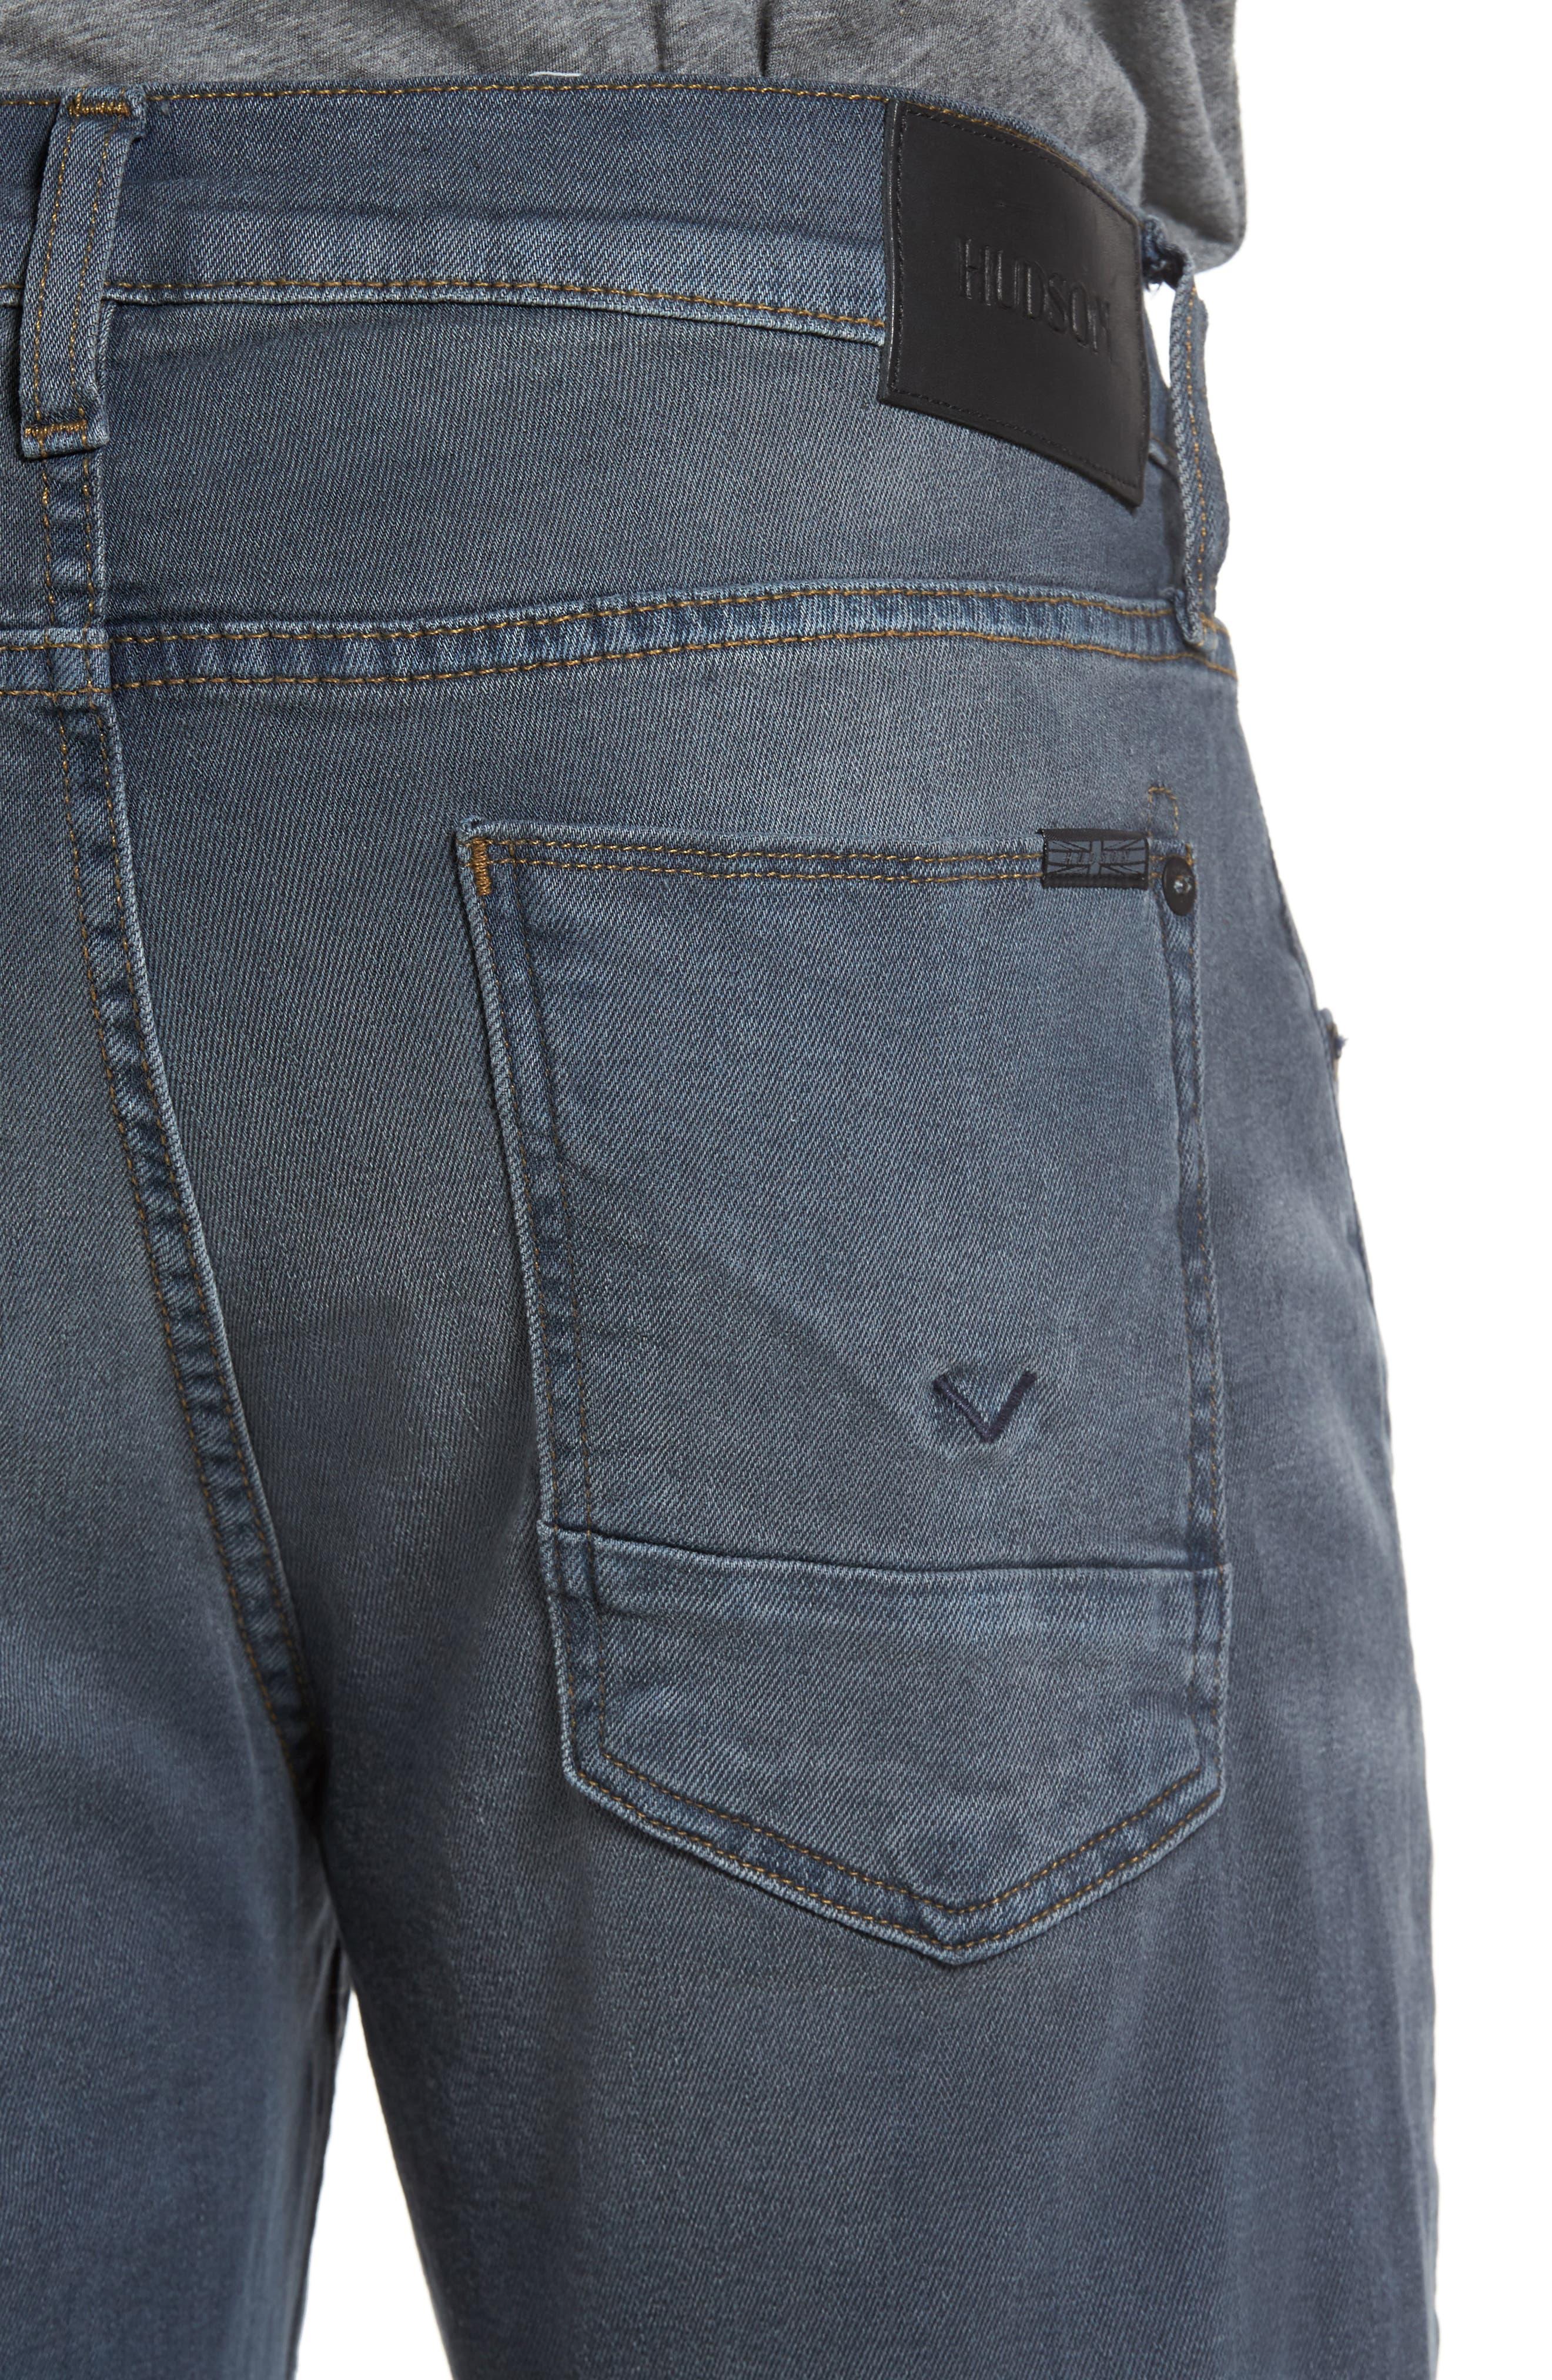 Byron Slim Straight Leg Jeans,                             Alternate thumbnail 4, color,                             020